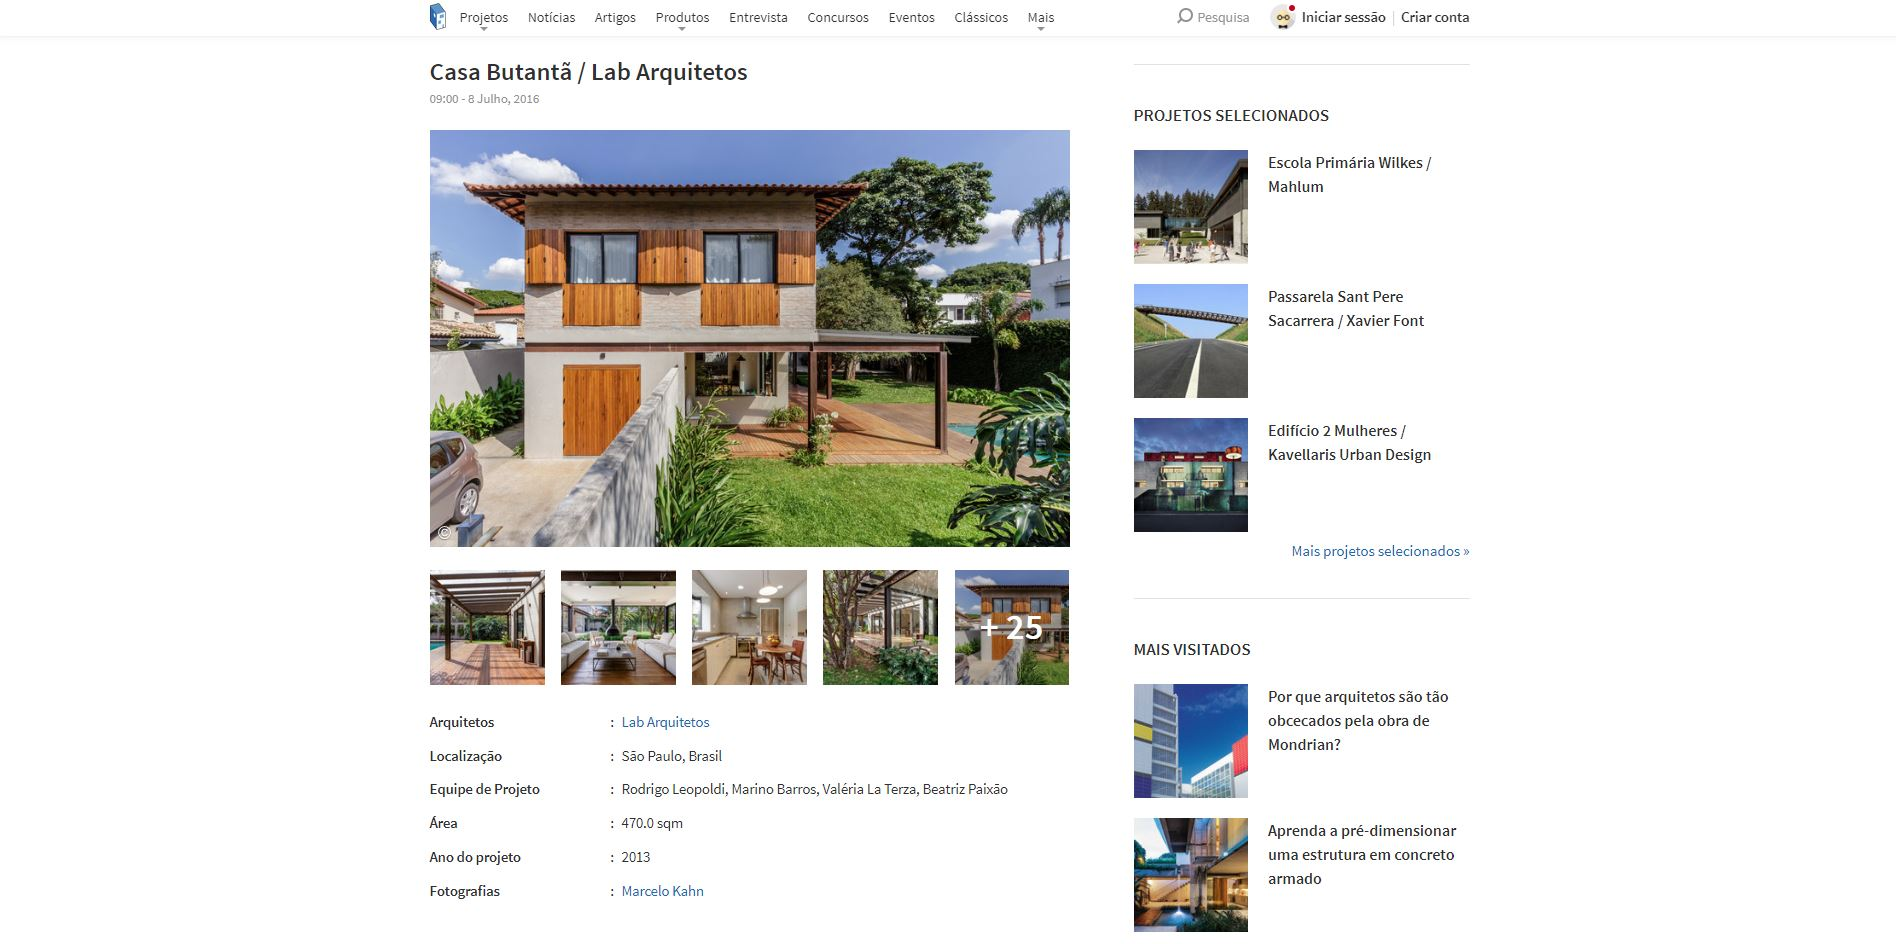 arquitetura-labarquitetos-residencial-publicacao-site-casabutanta-capa